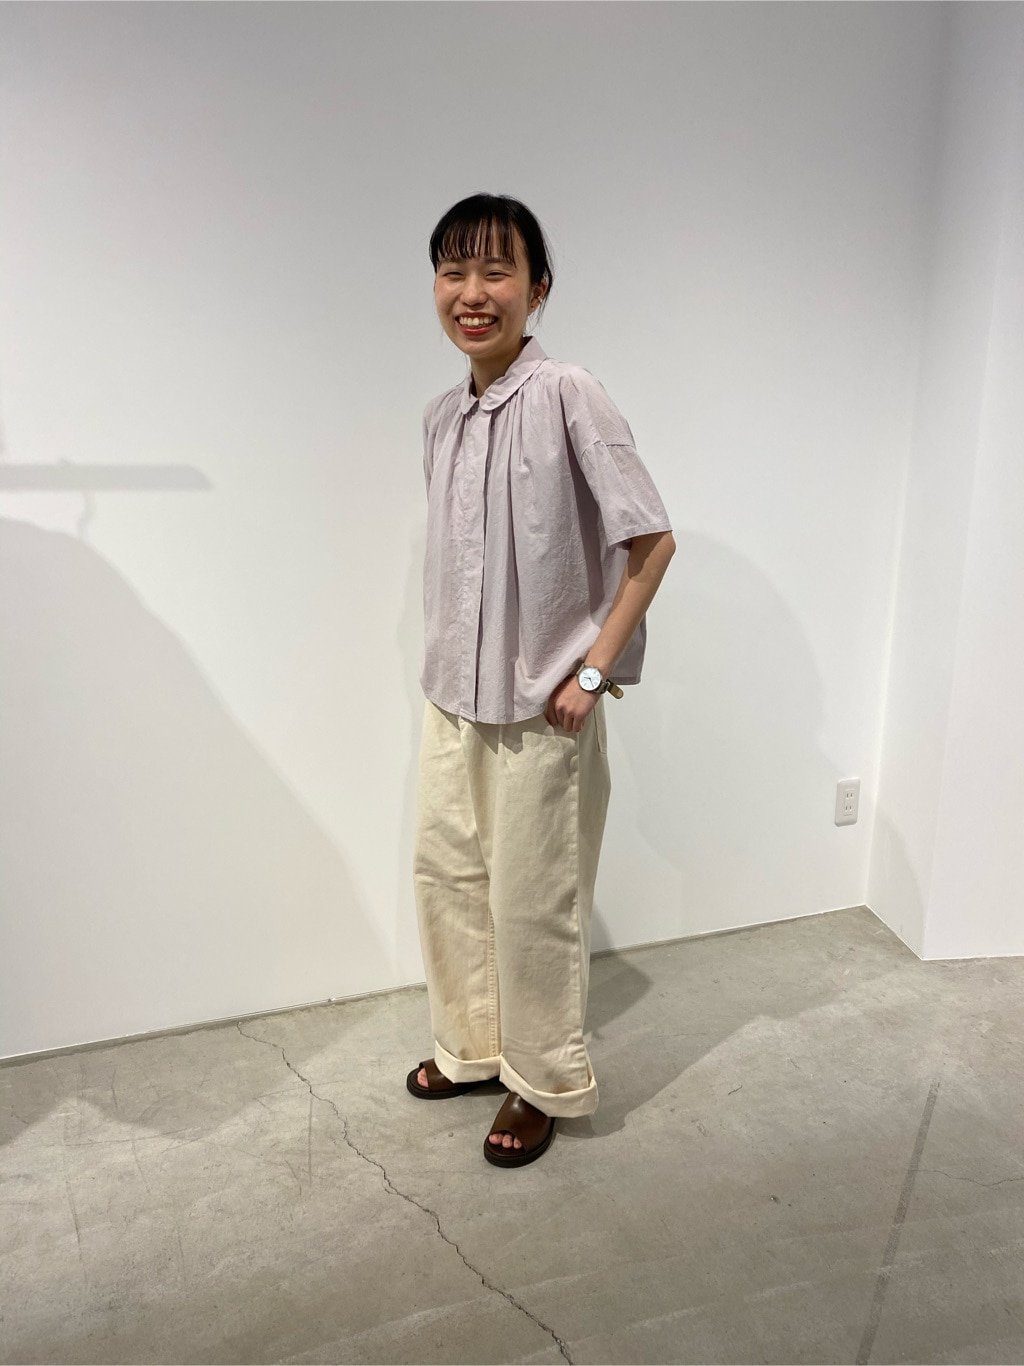 l'atelier du savon 名古屋栄路面 身長:152cm 2020.05.29